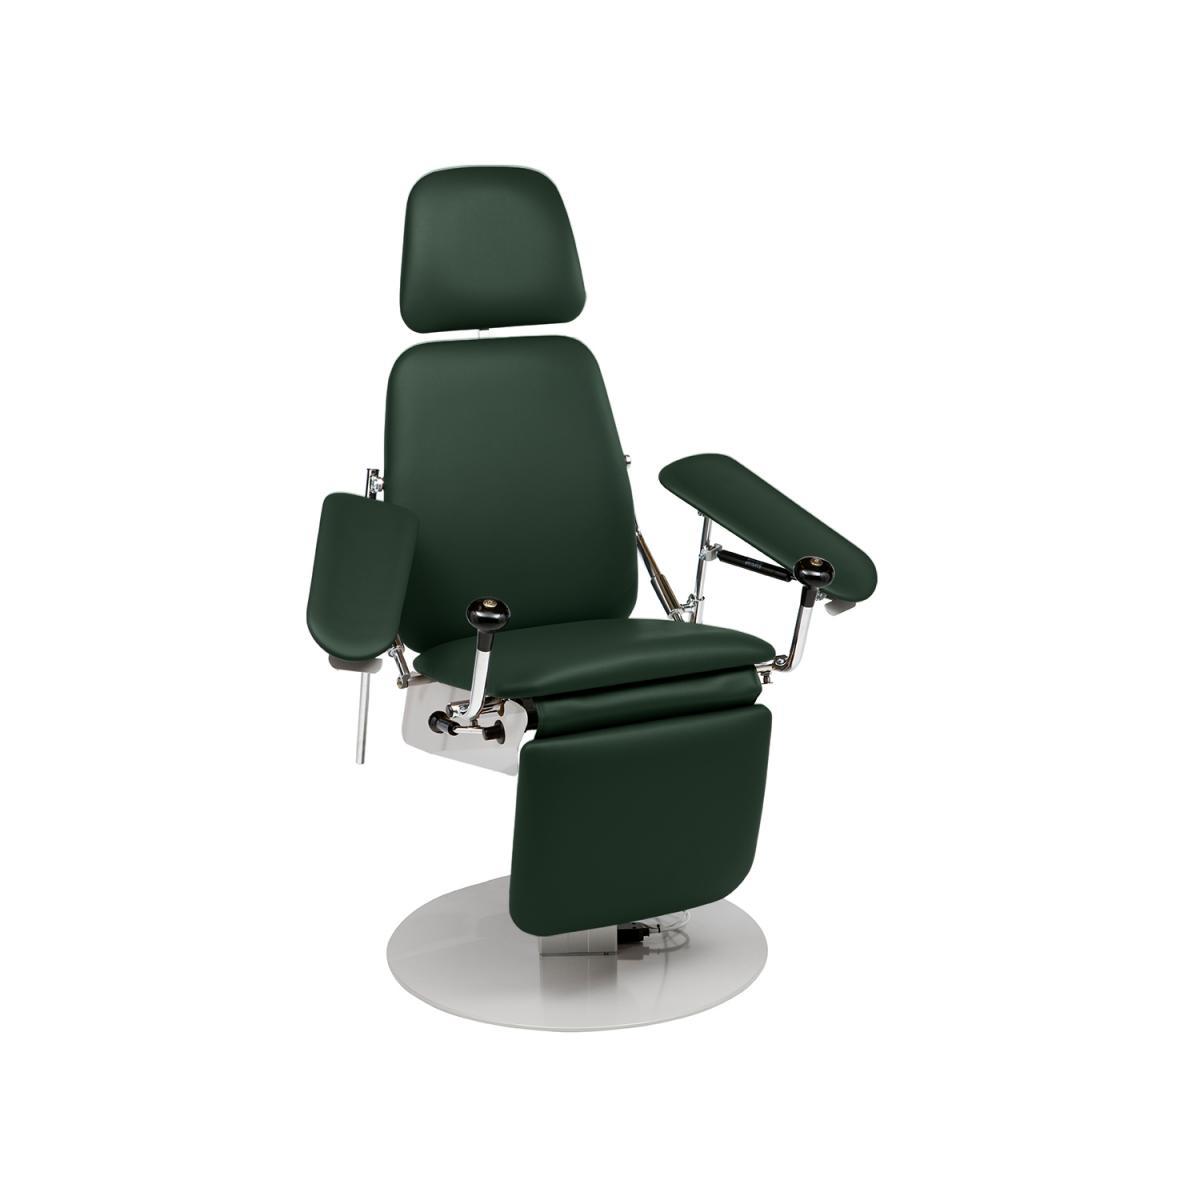 Sampling chair 610